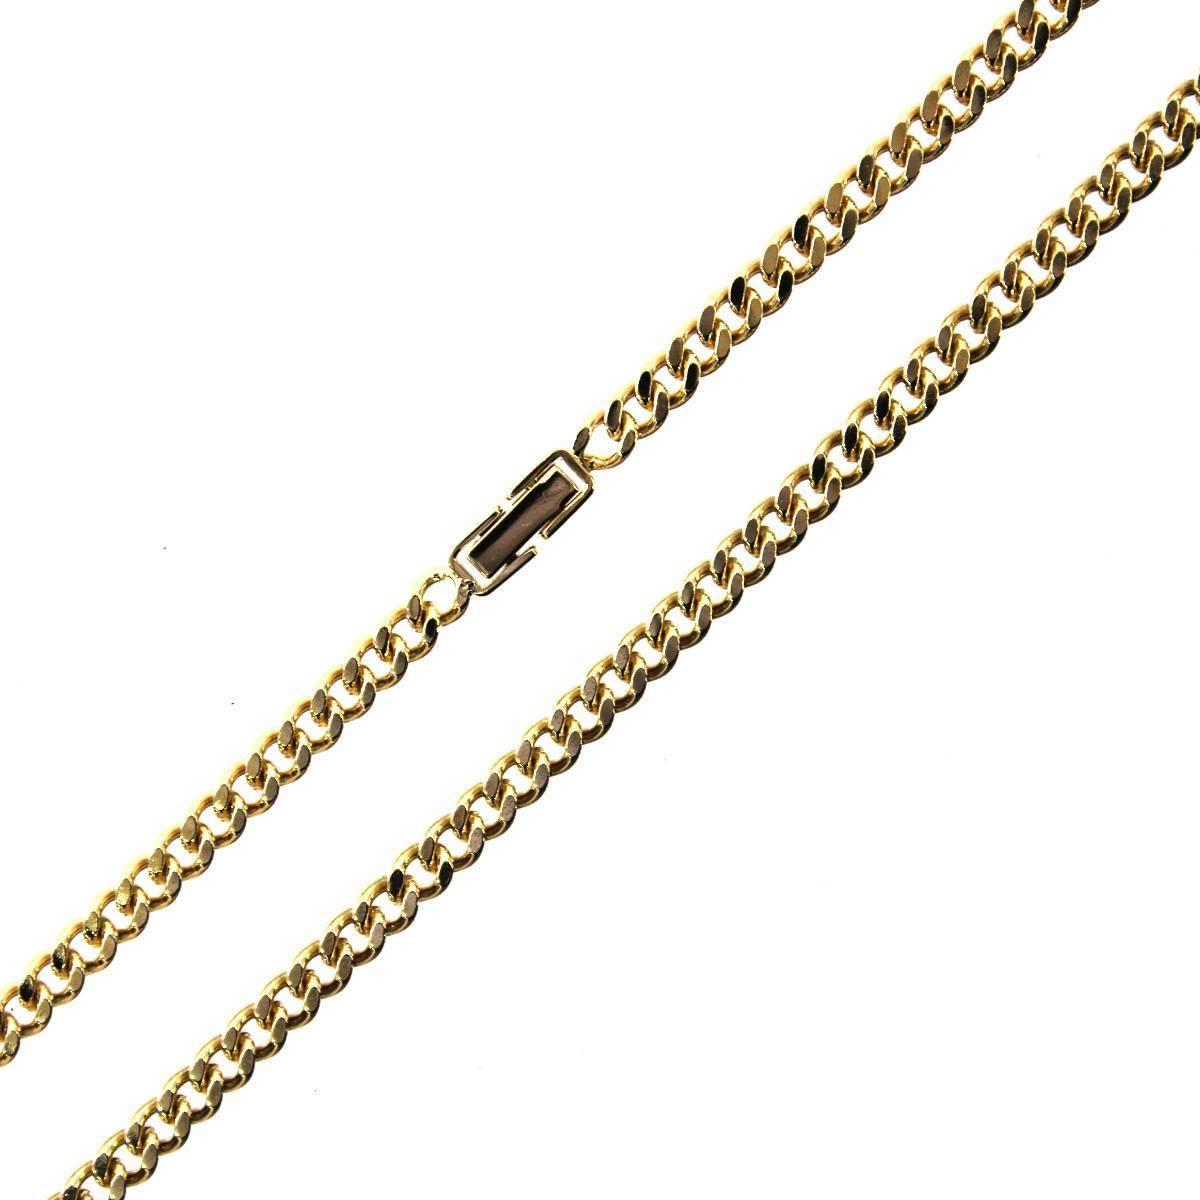 K18 18金 ゴールド 喜平 2面 ネックレス チェーン 66cm 41.3g KA 磨き仕上げ品 Aランク_画像1